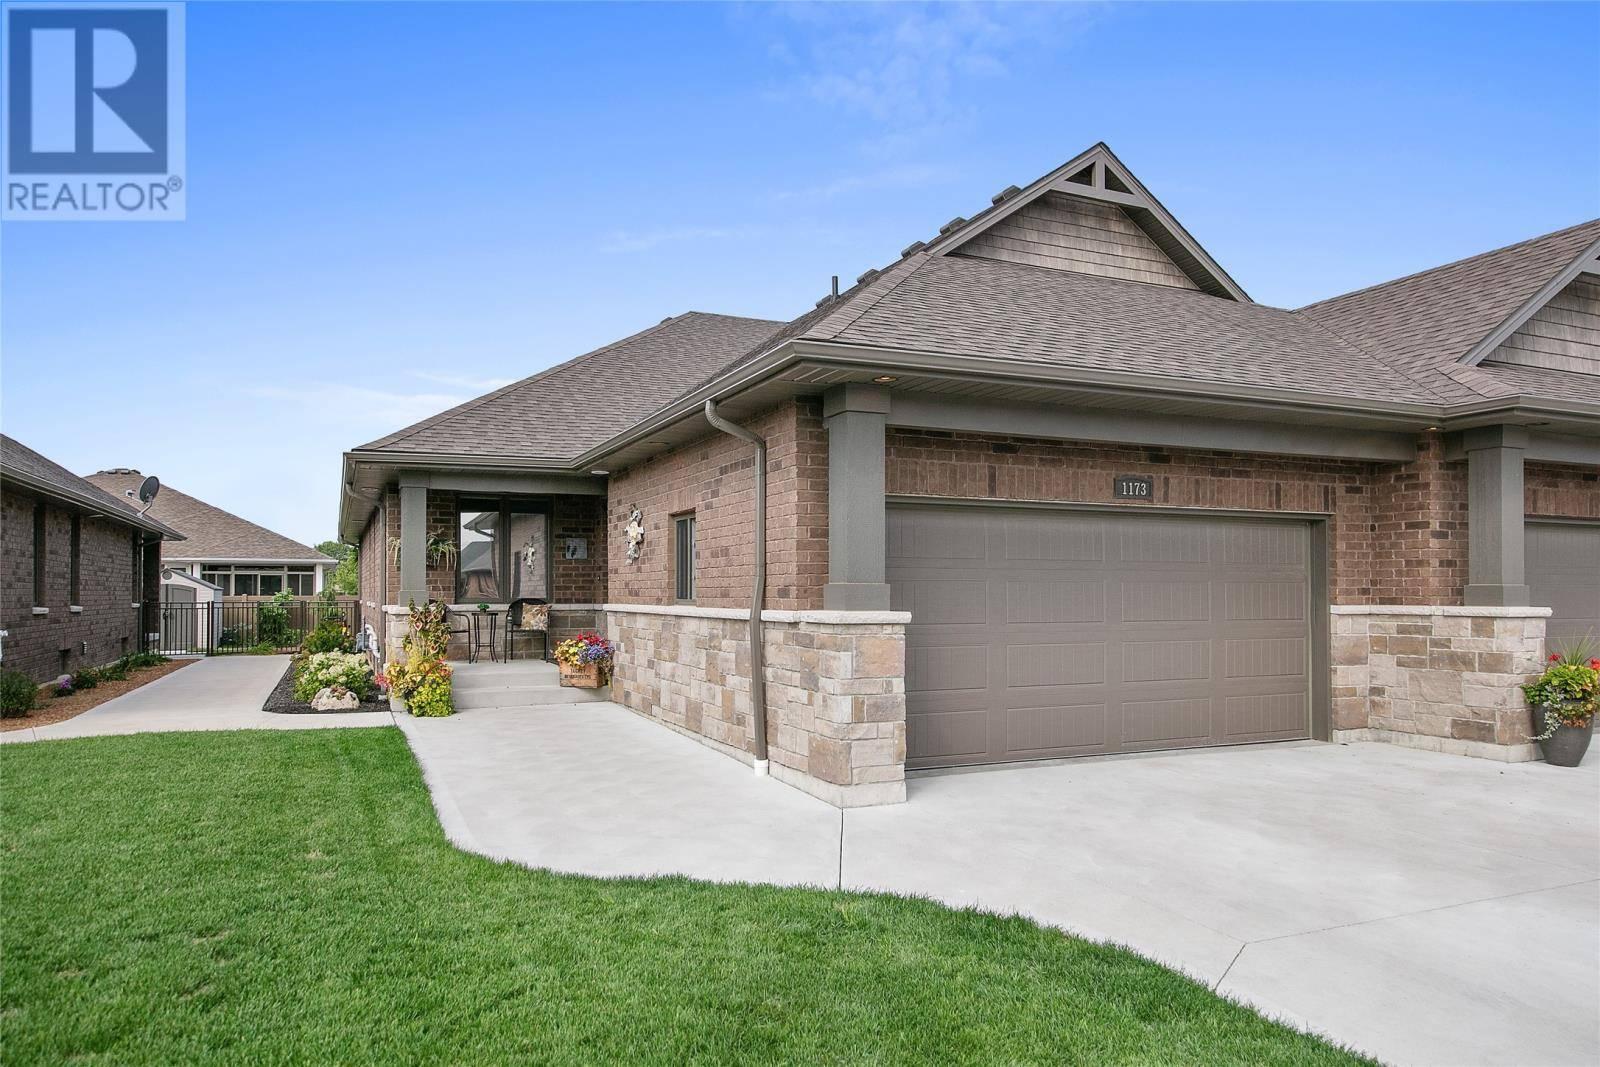 House for sale at 1173 Kassas St Lasalle Ontario - MLS: 19023597